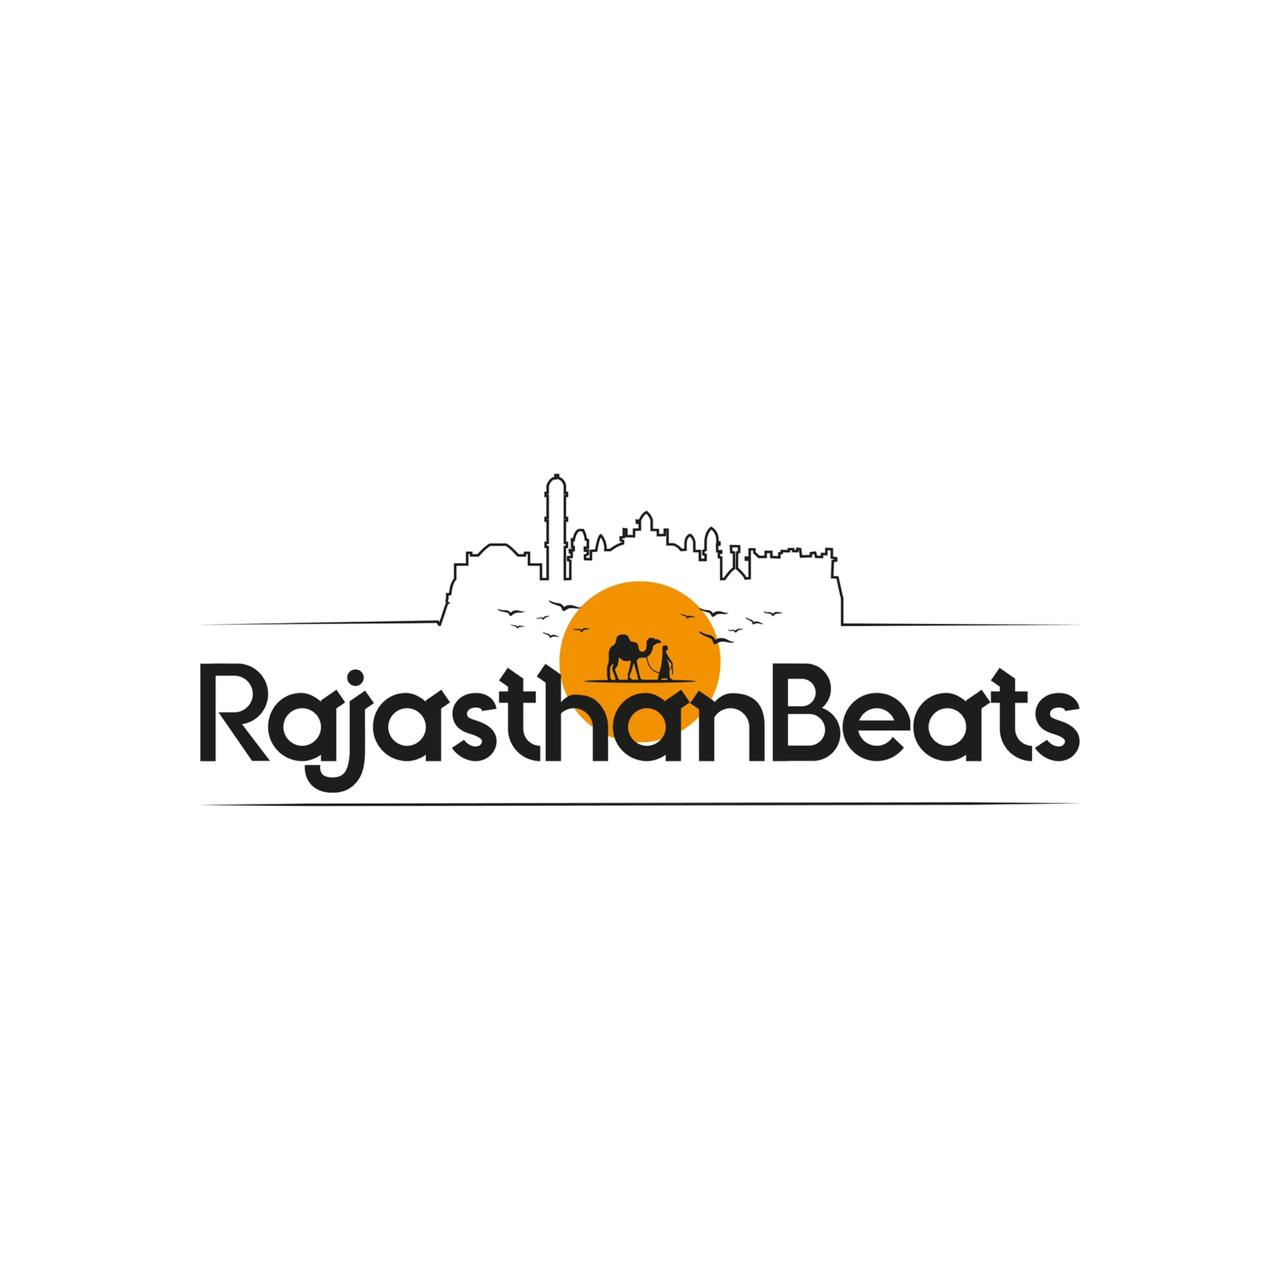 RajasthanBeats